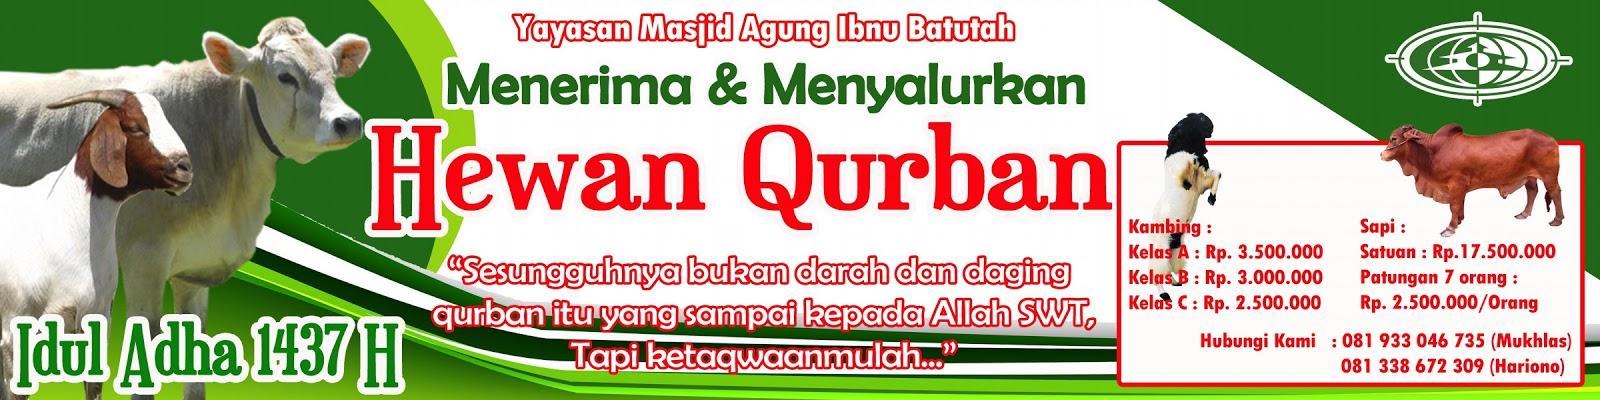 Contoh Banner Jual Hewan Qurban - kumpulan gambar spanduk